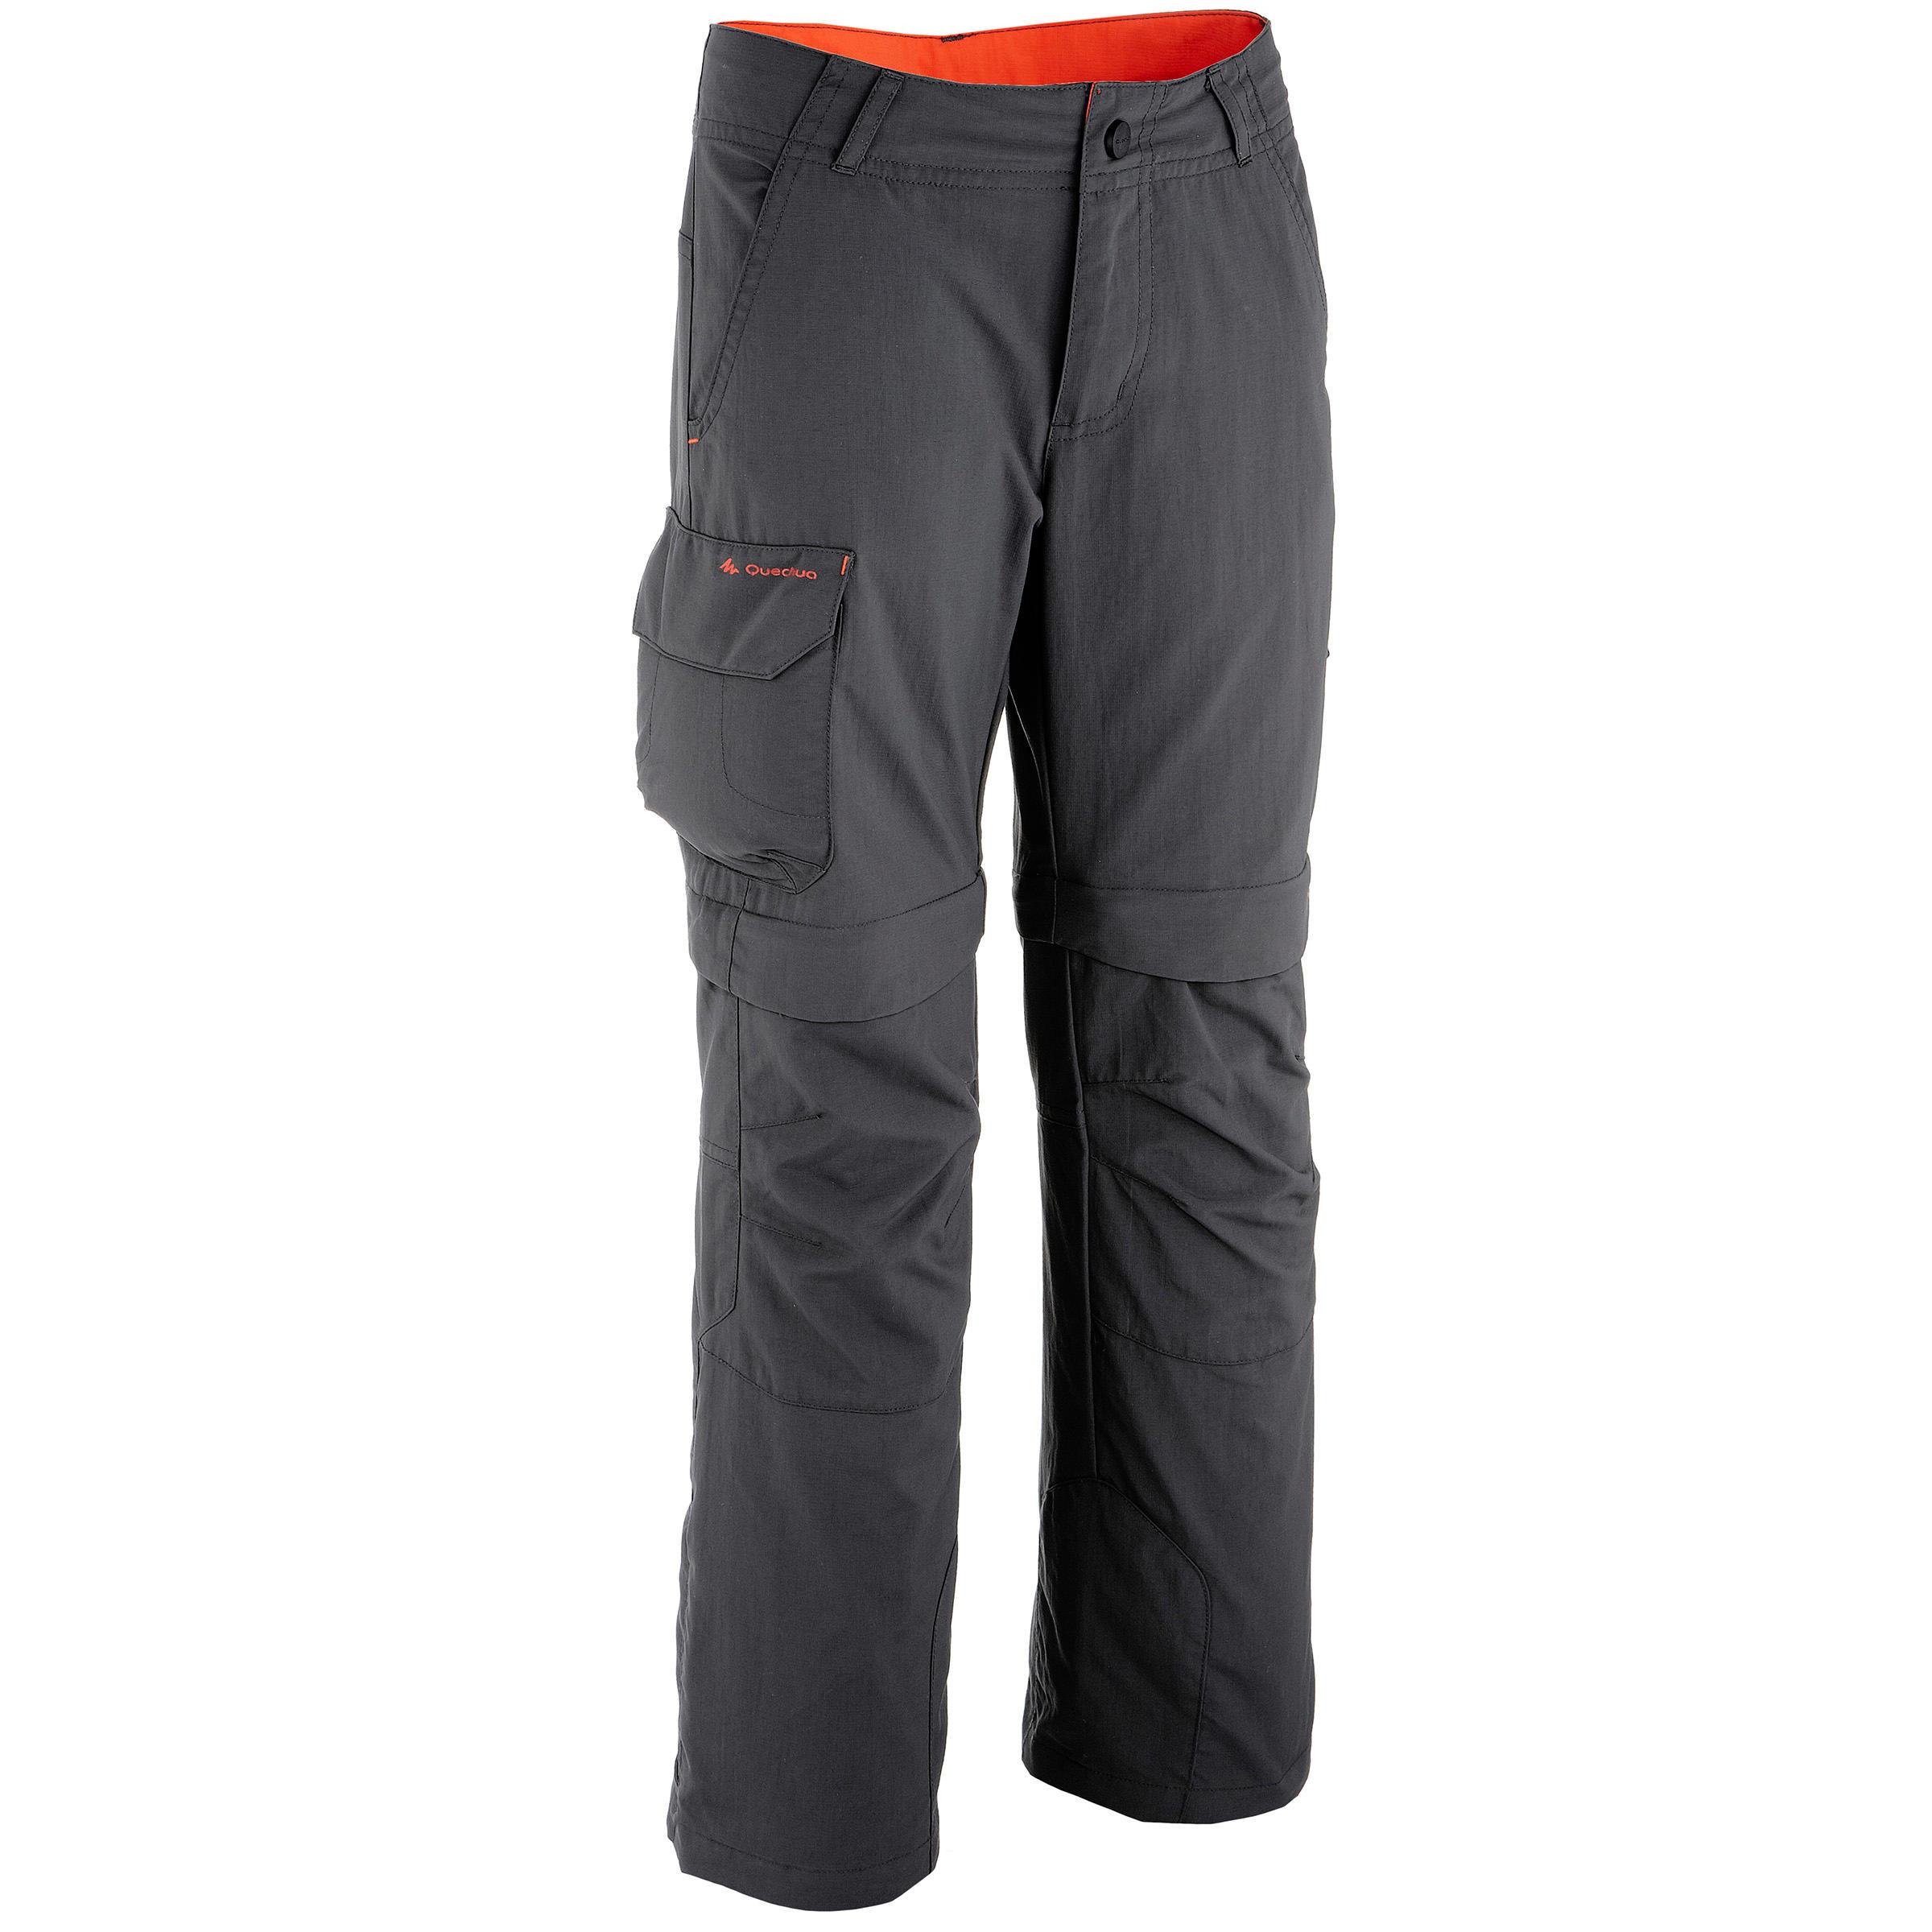 Hike 900 Boy's Black Hiking Modular Trousers